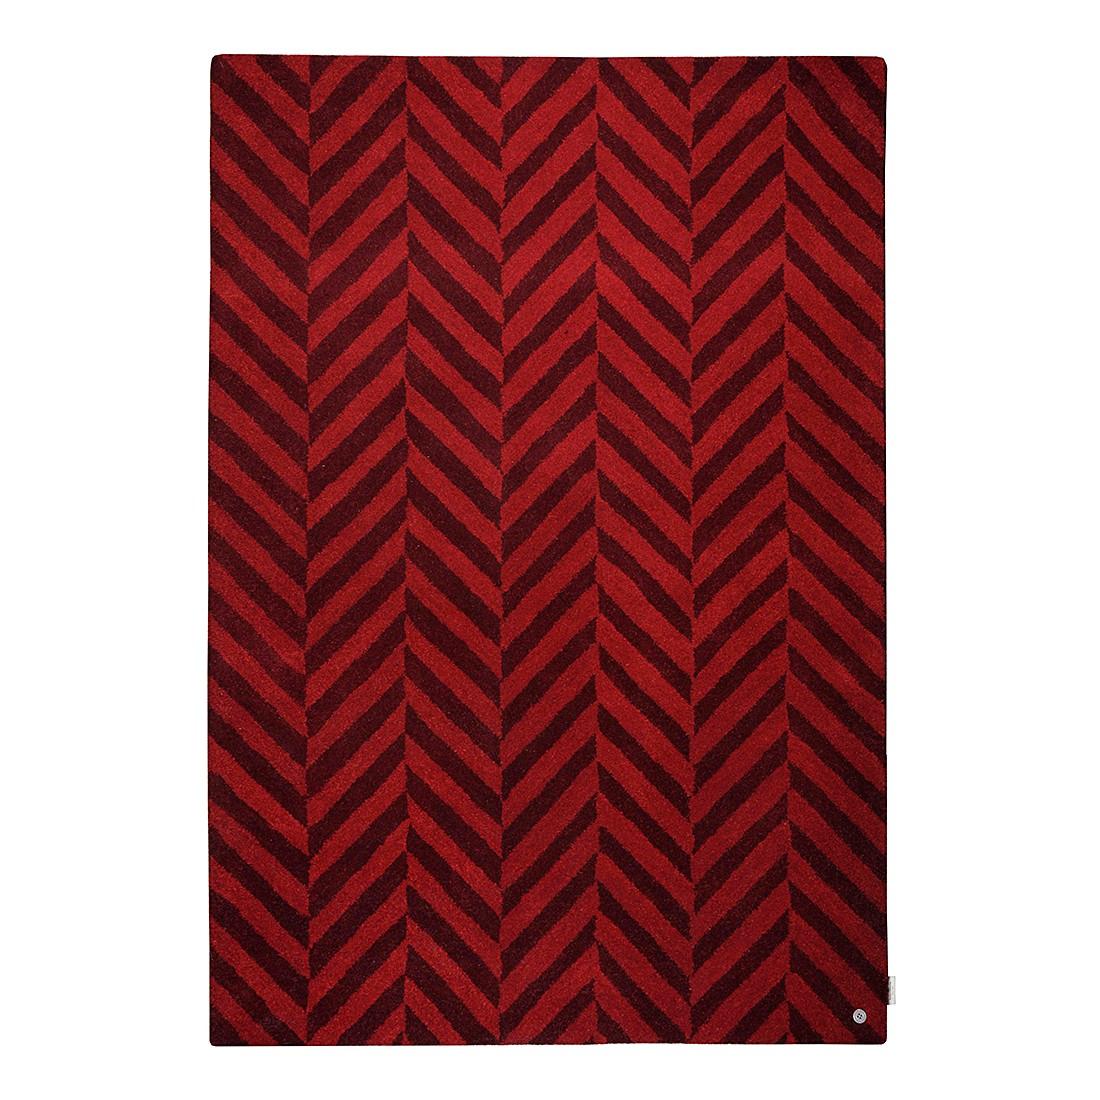 Teppich Country Zigzag – Rot – Maße: 140 x 200 cm, Tom Tailor jetzt kaufen